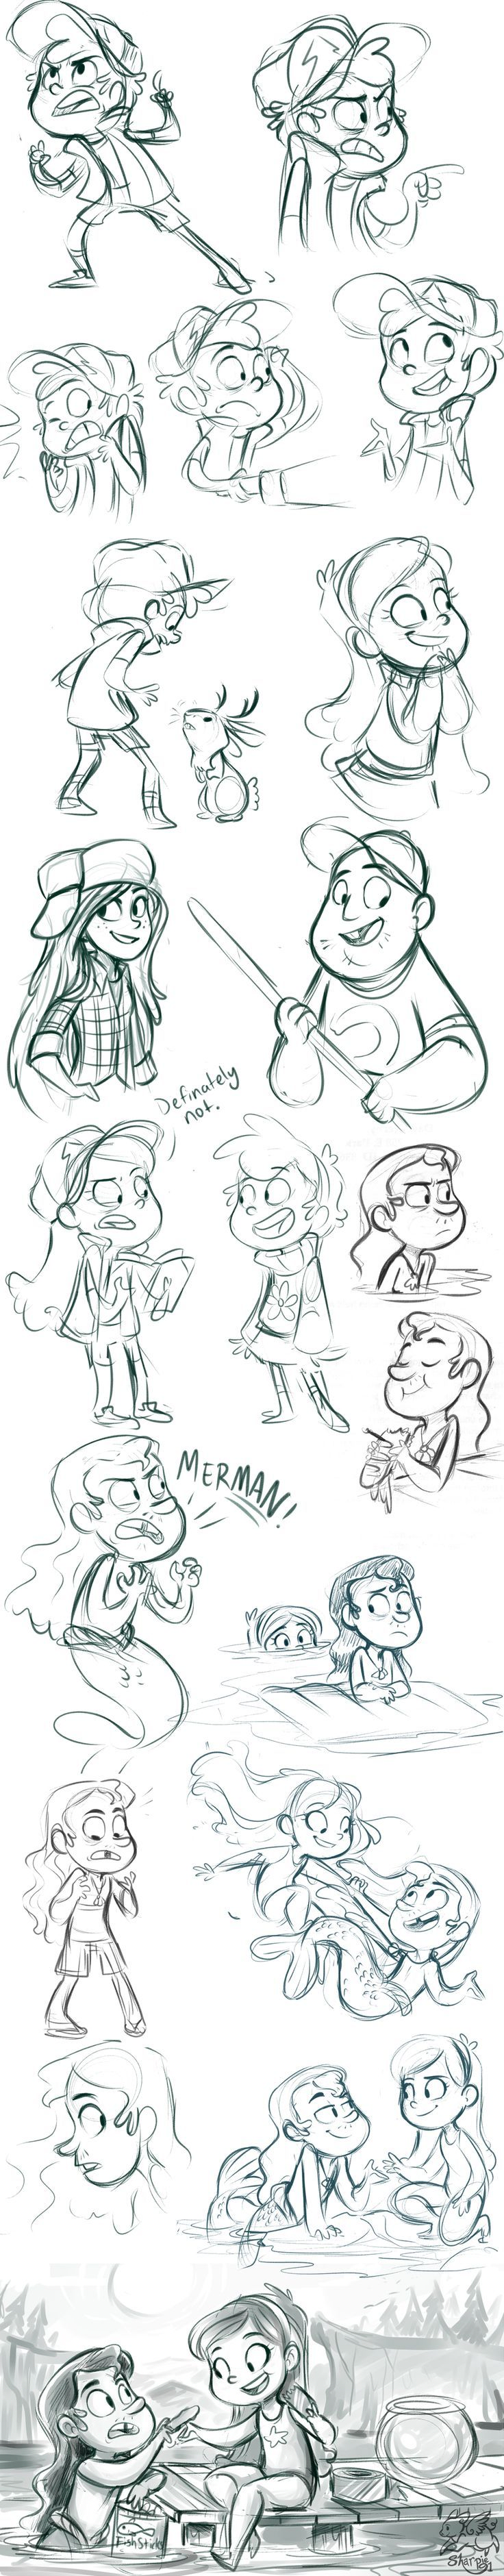 Gravity Falls Stuff by sharpie91.deviantart.com on @deviantART: